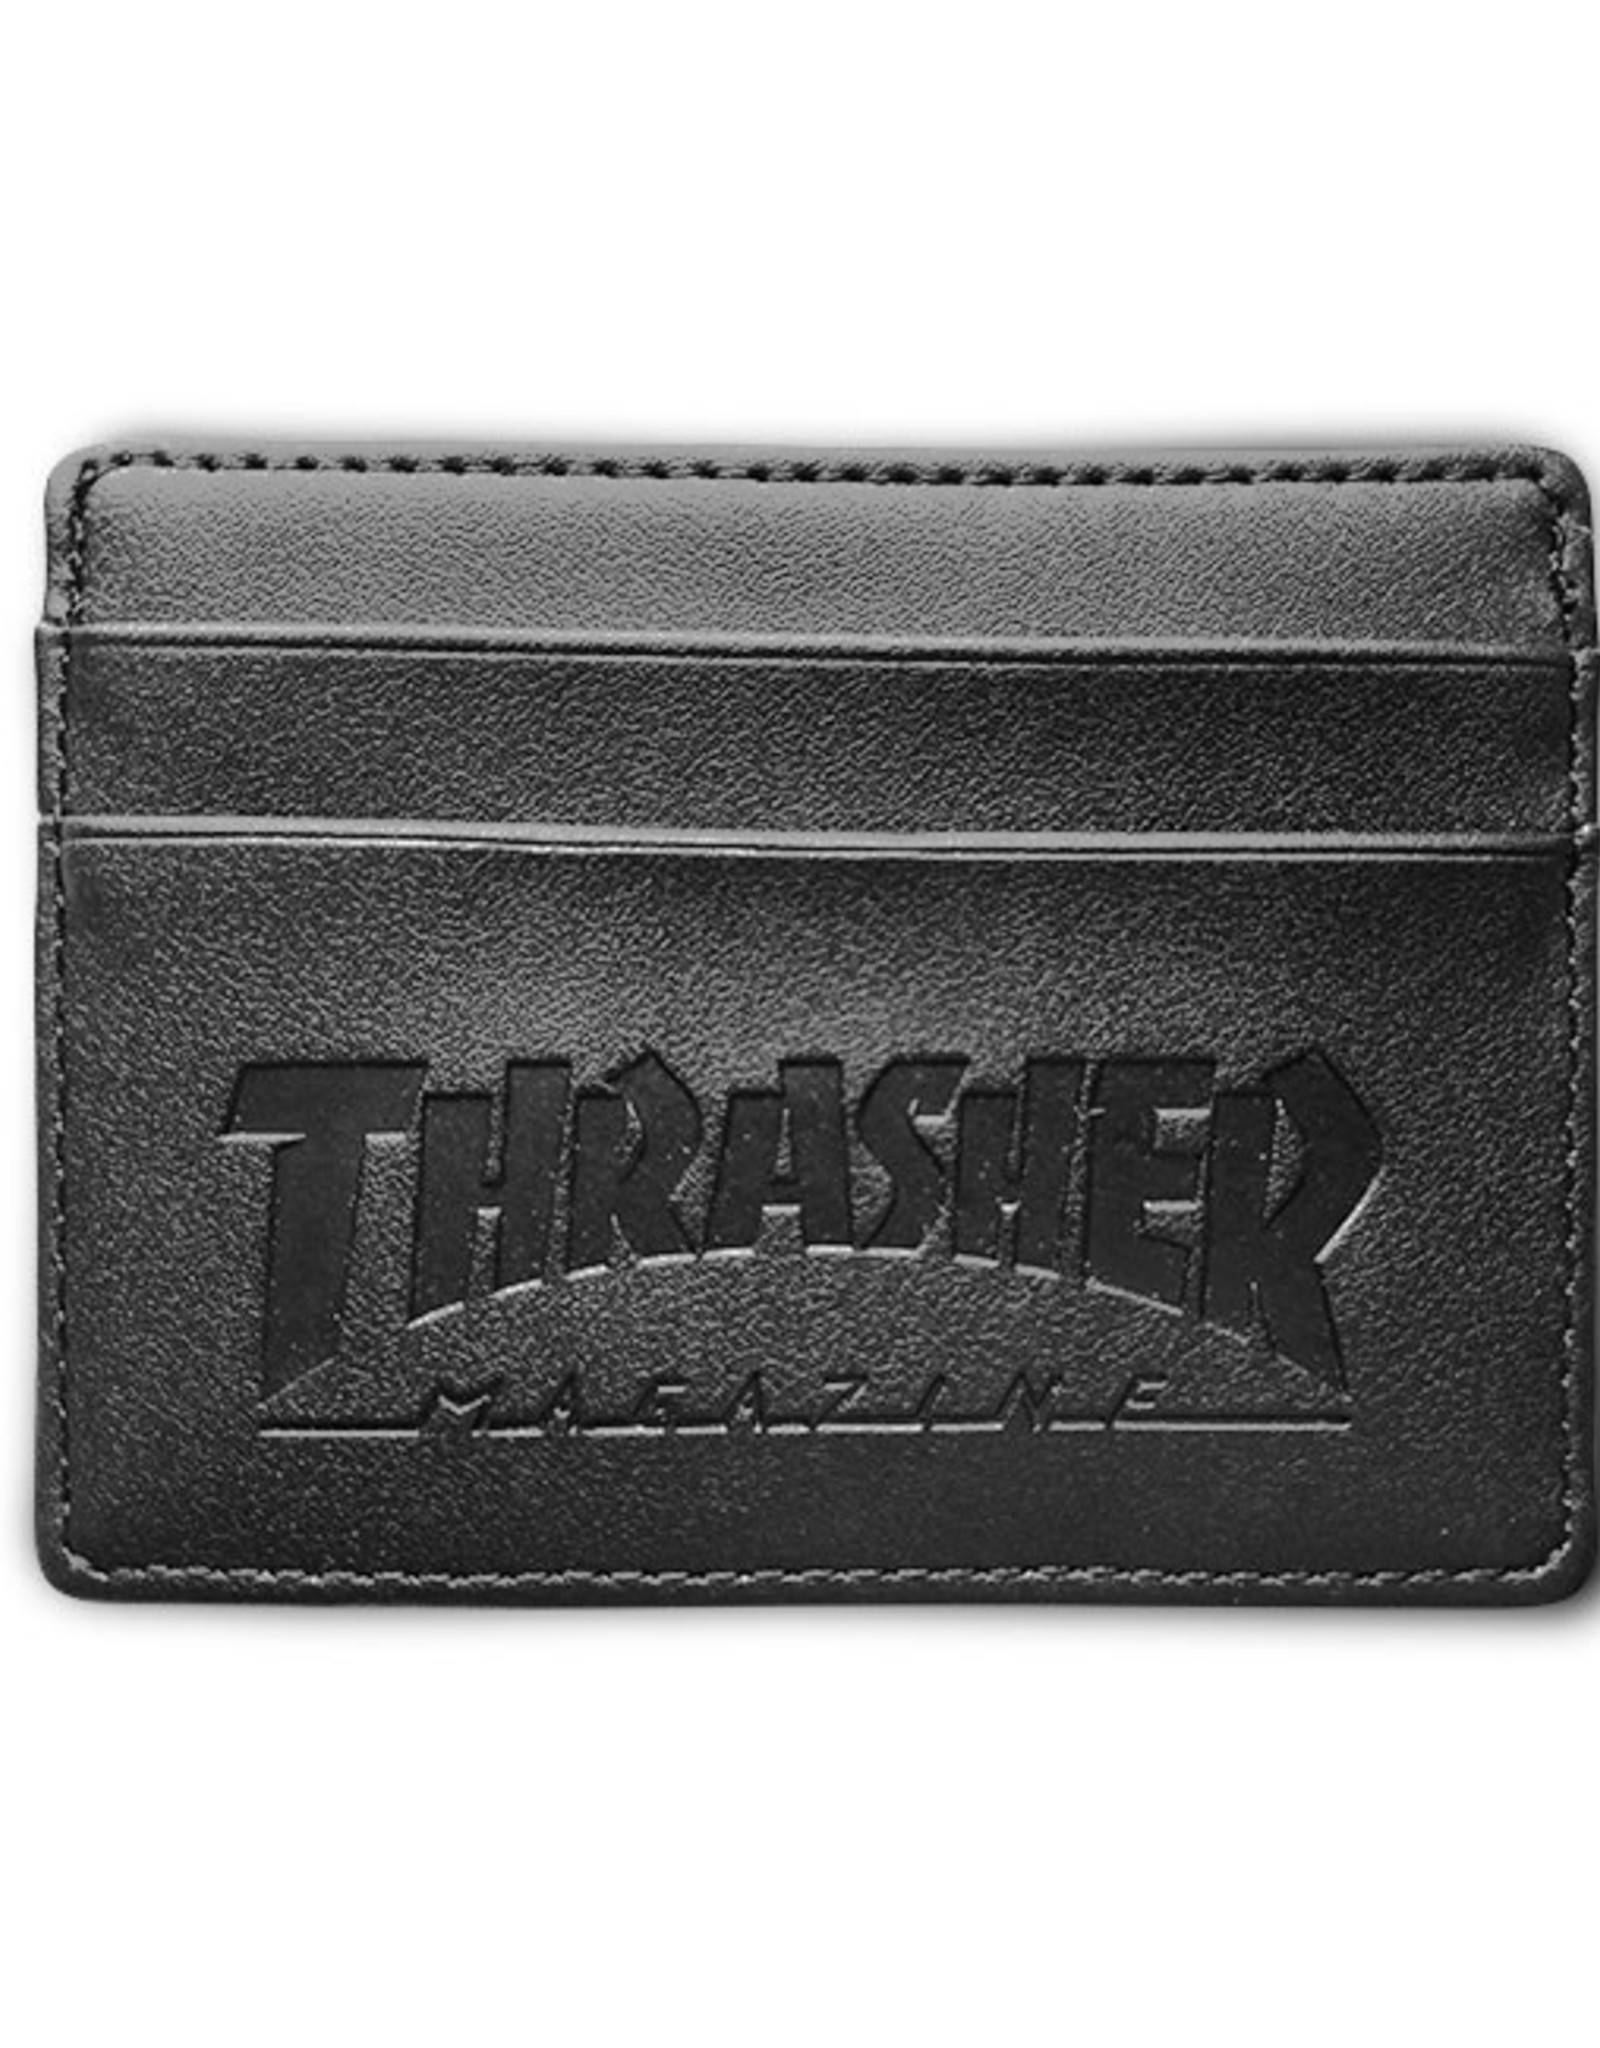 THRASHER THRASHER LEATHER CARD WALLET